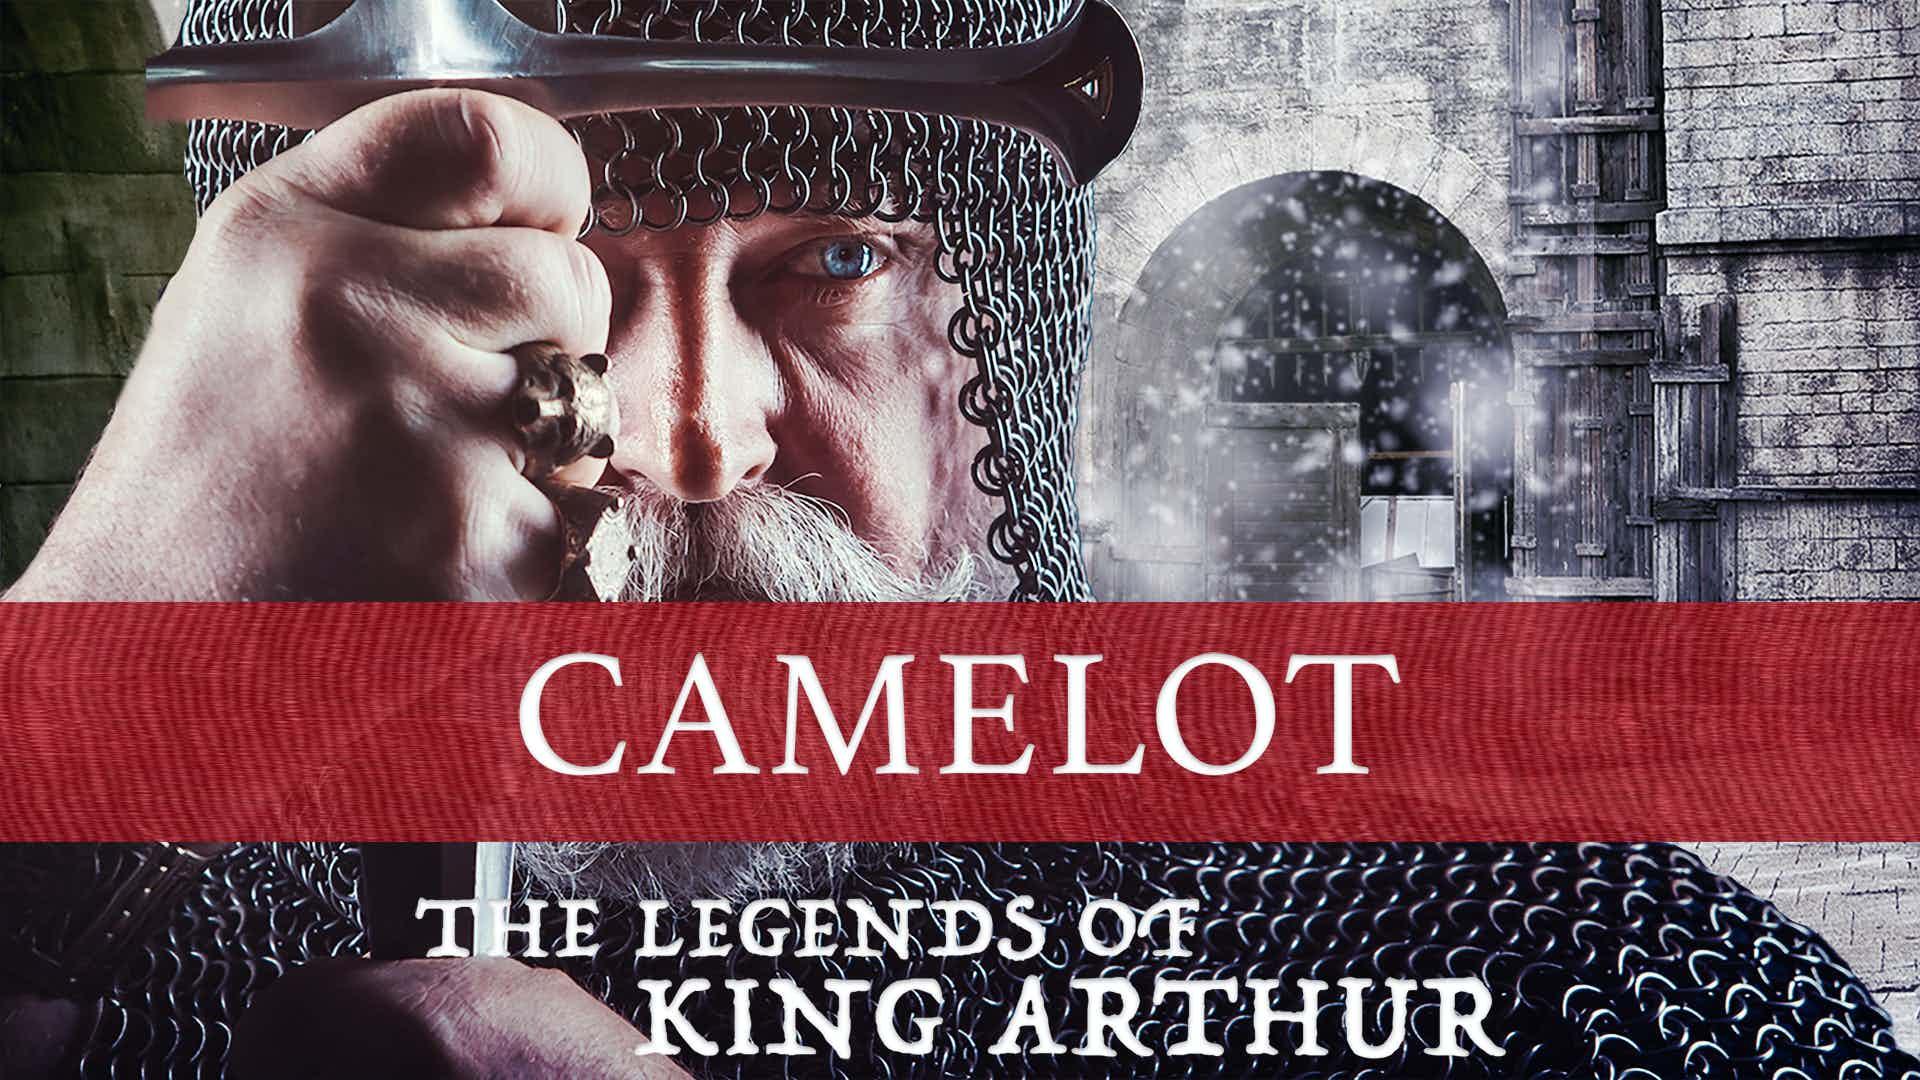 The Legends Of King Arthur: Camelot